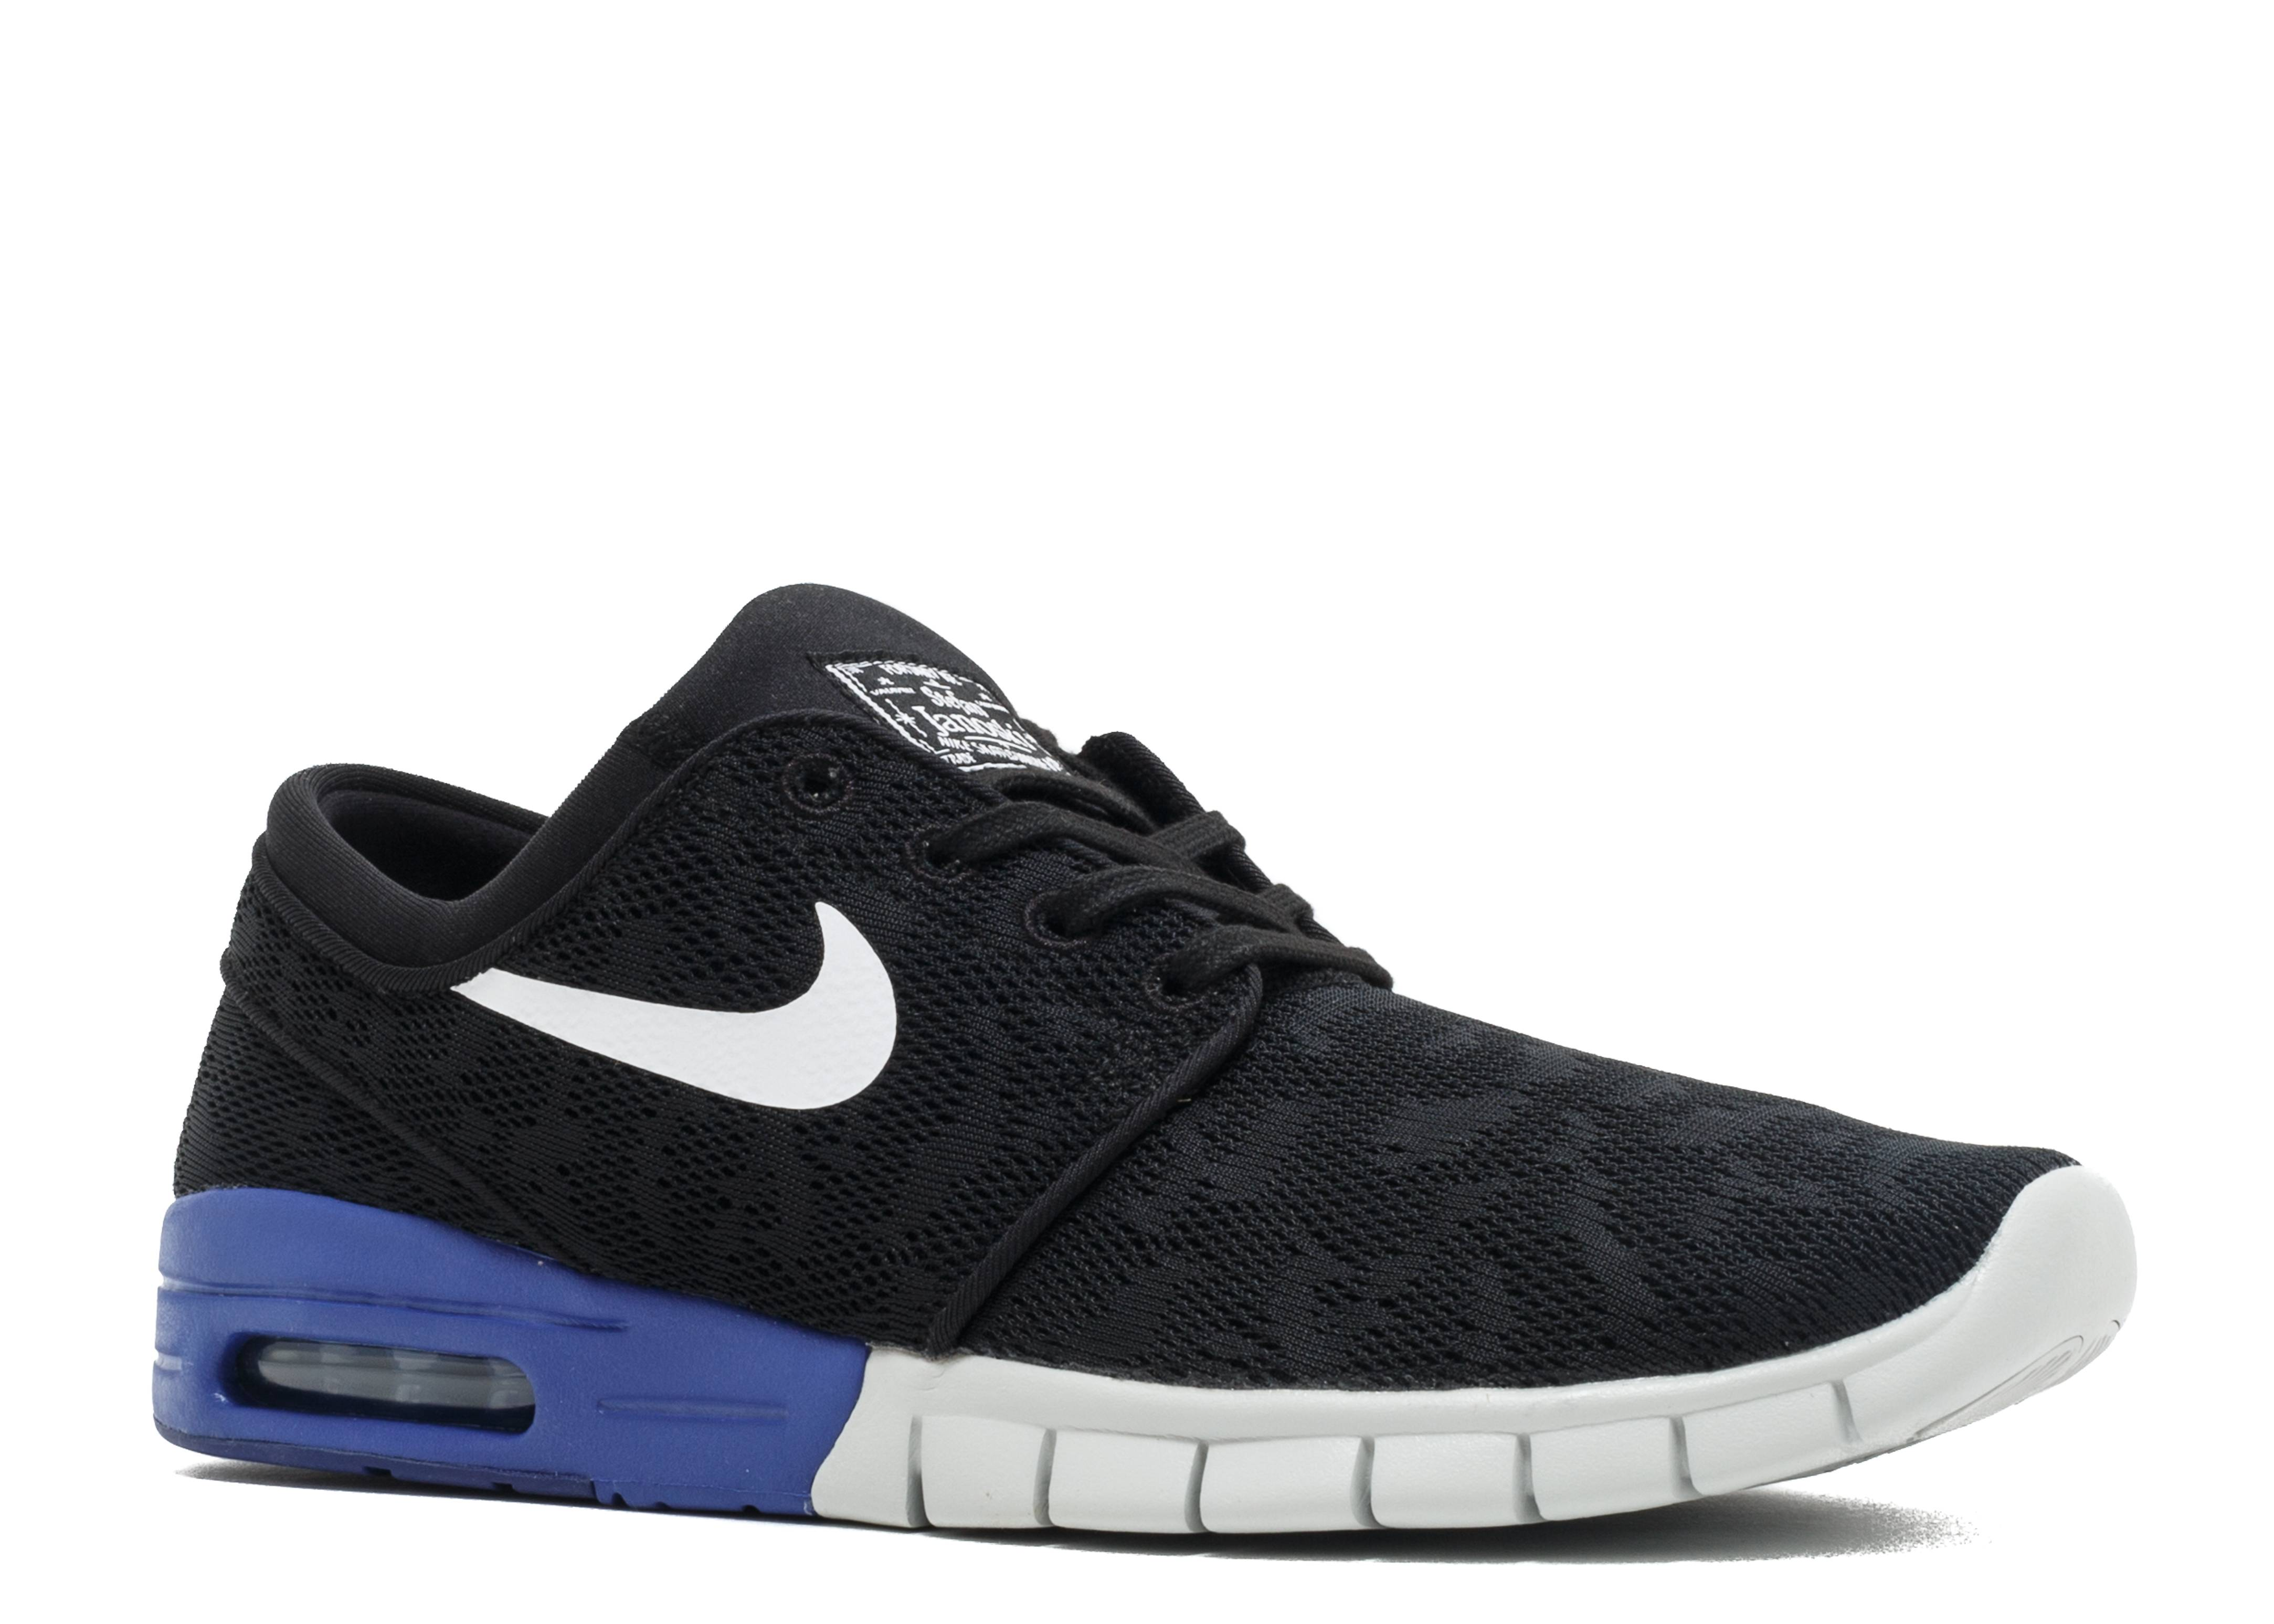 Nike SB Stefan Janoski Max Black Deep Night Blue White Sz 9.5 631303-015